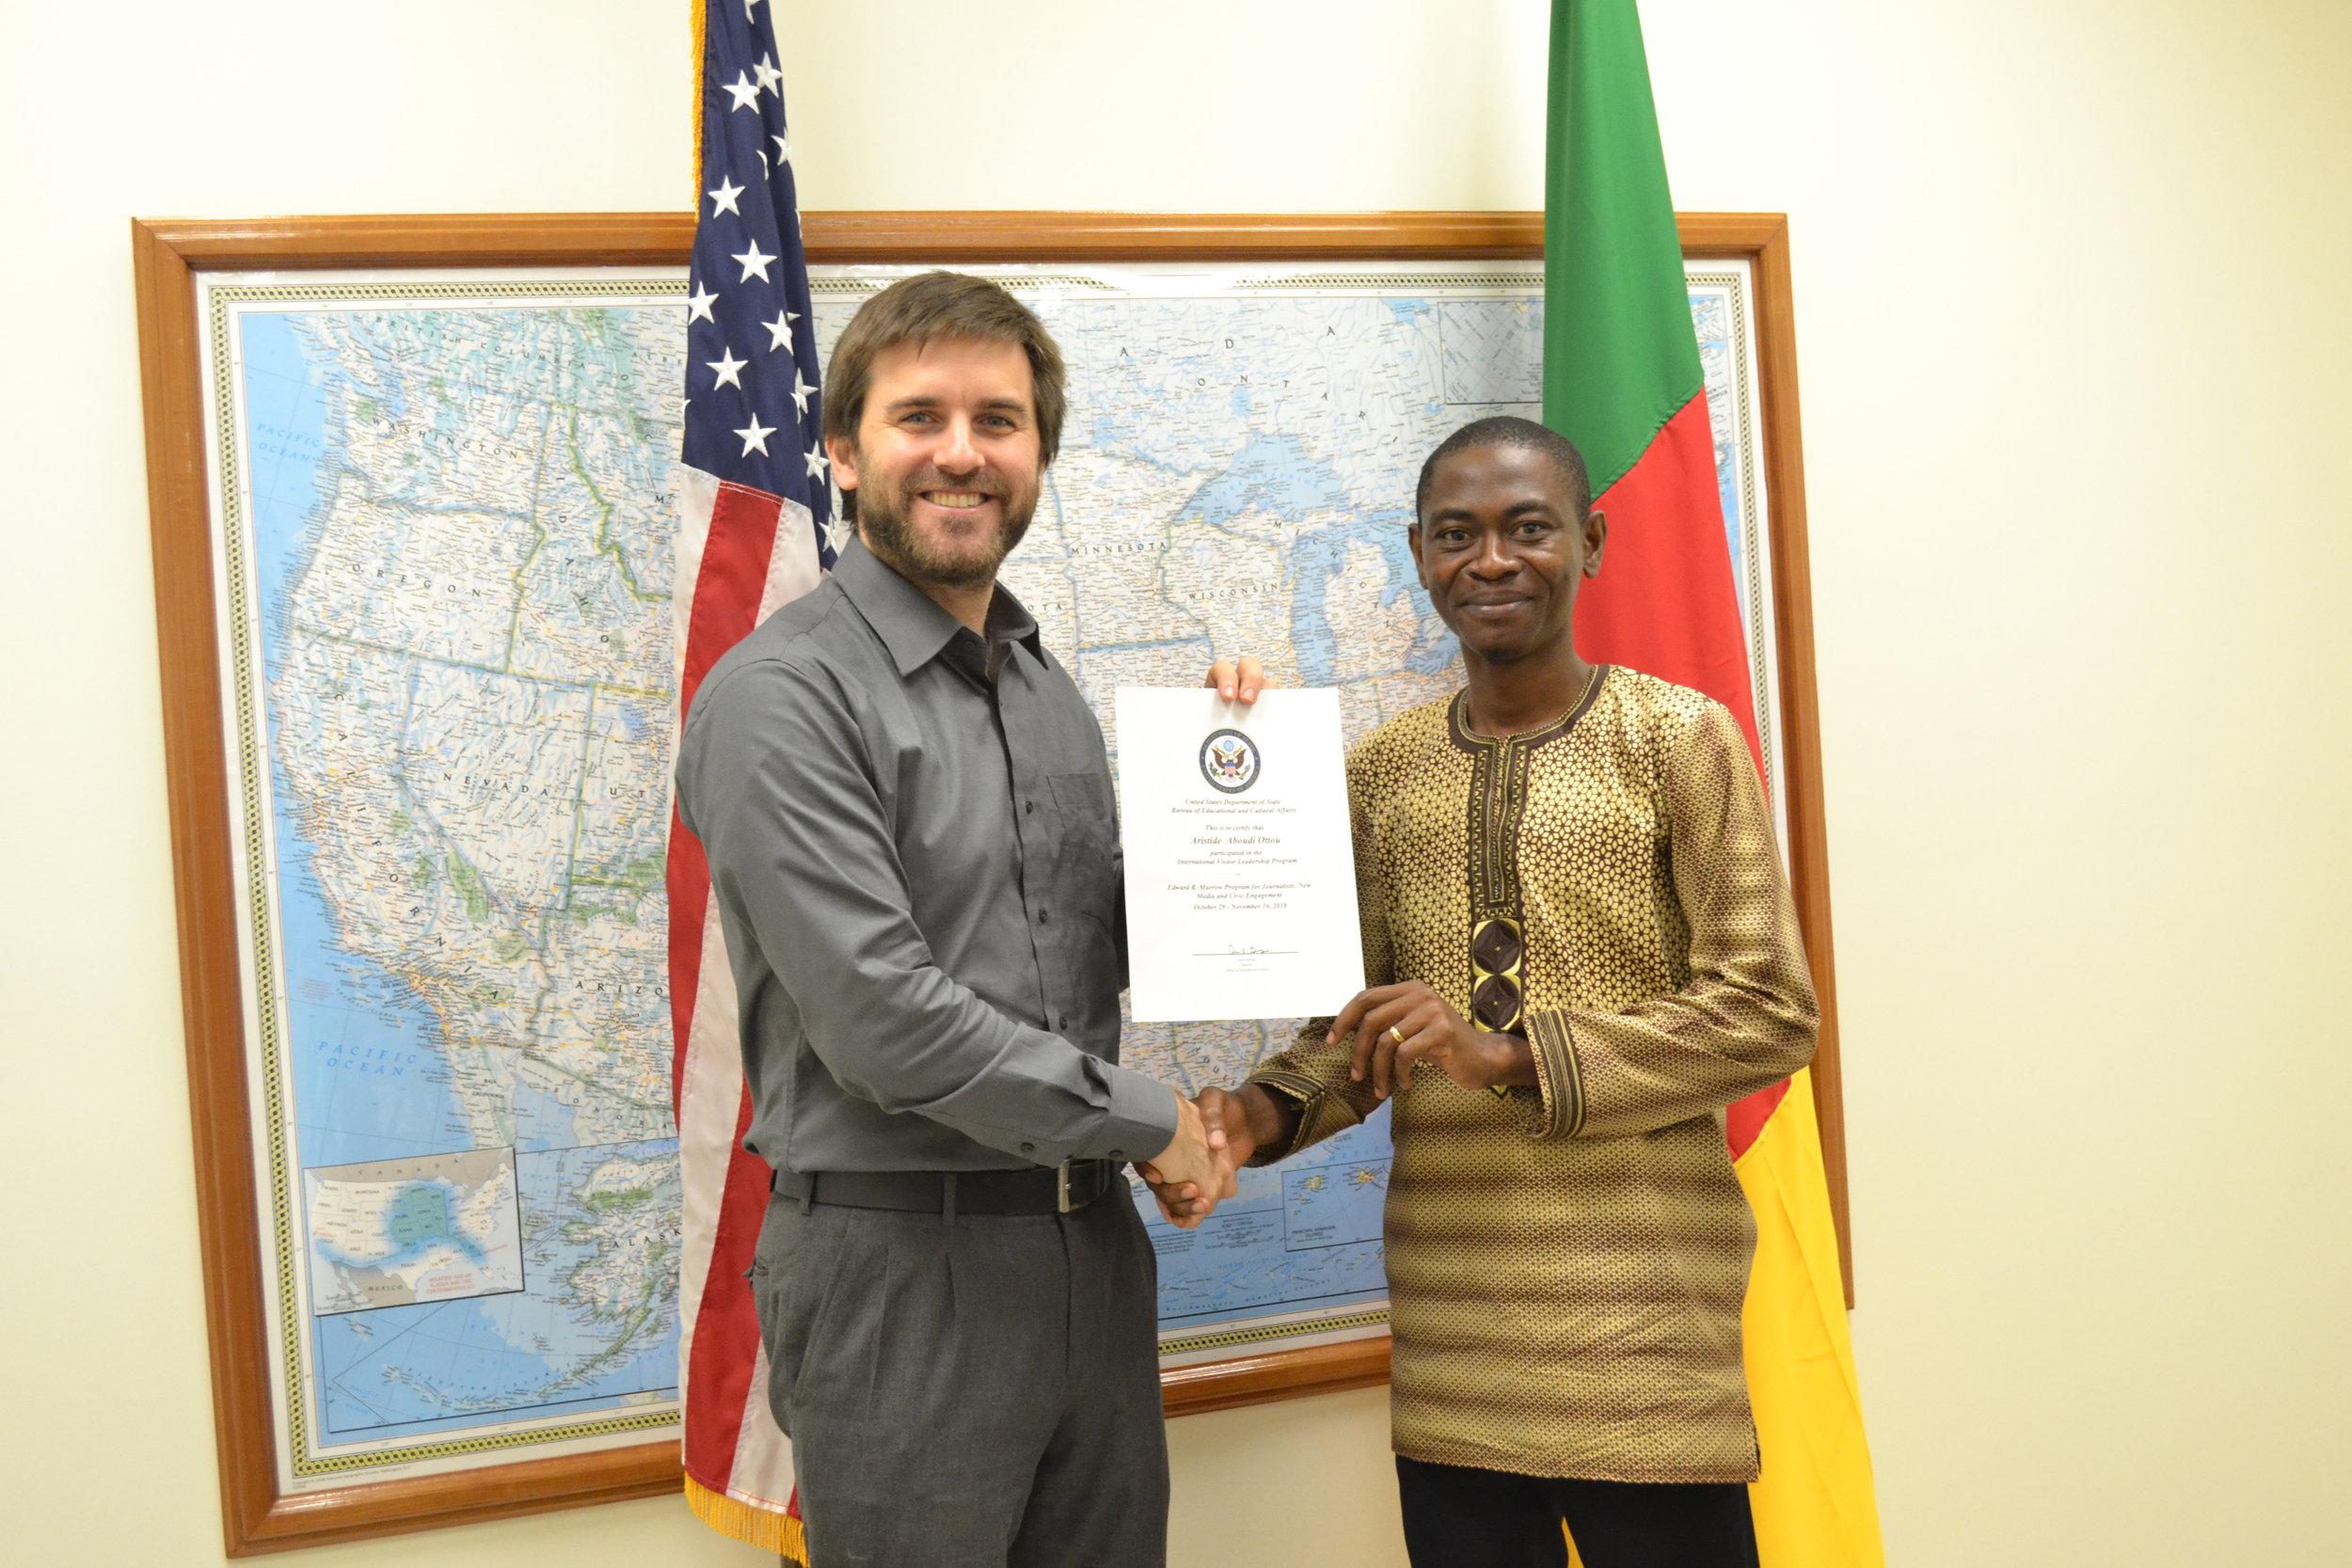 Aristide_Integrity in Journalism.JPG